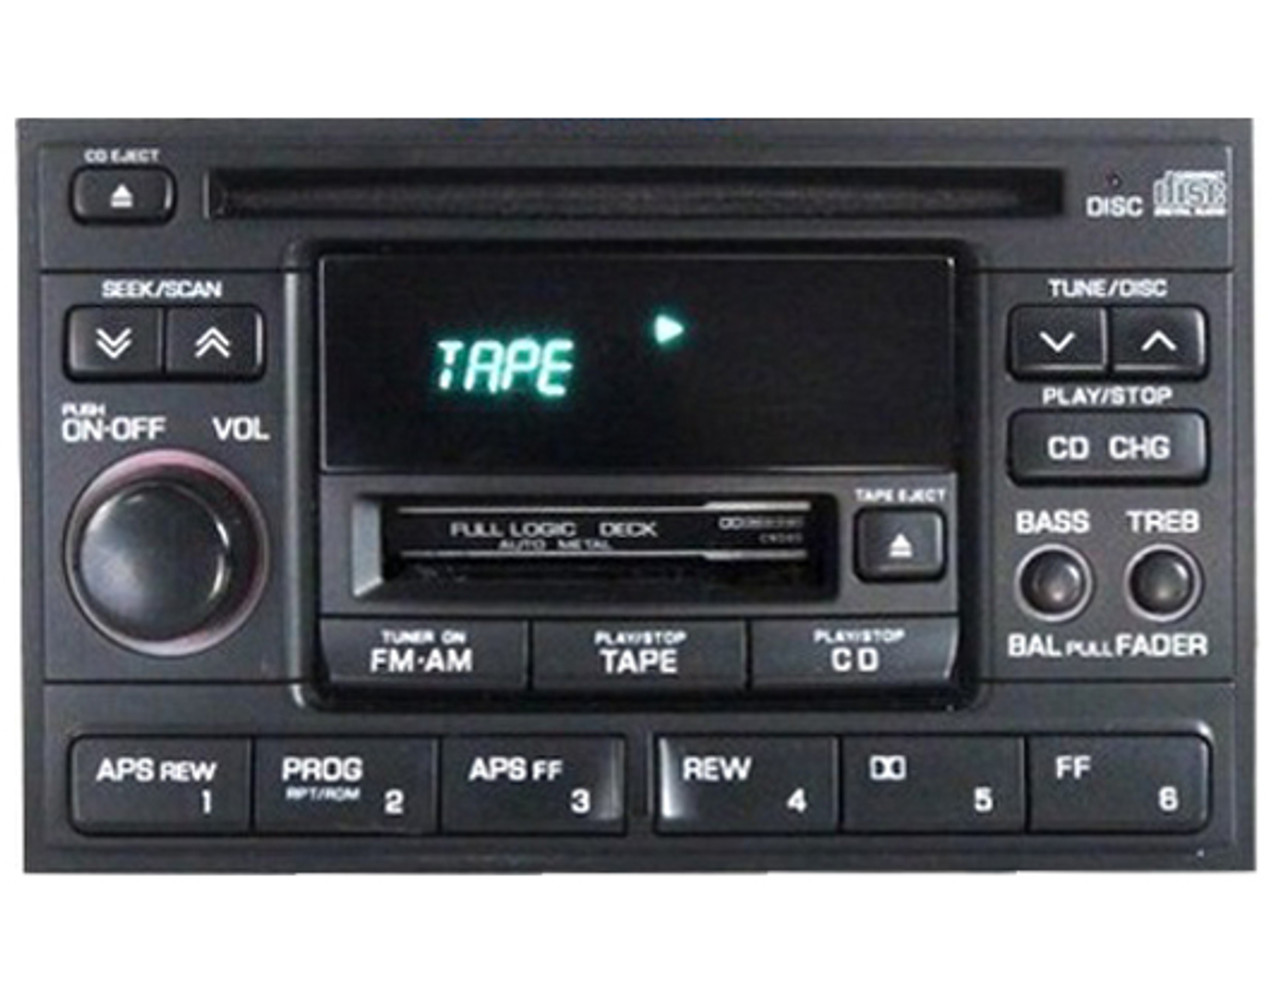 ni175u 97 98 nissan maxima radio cd and tape player